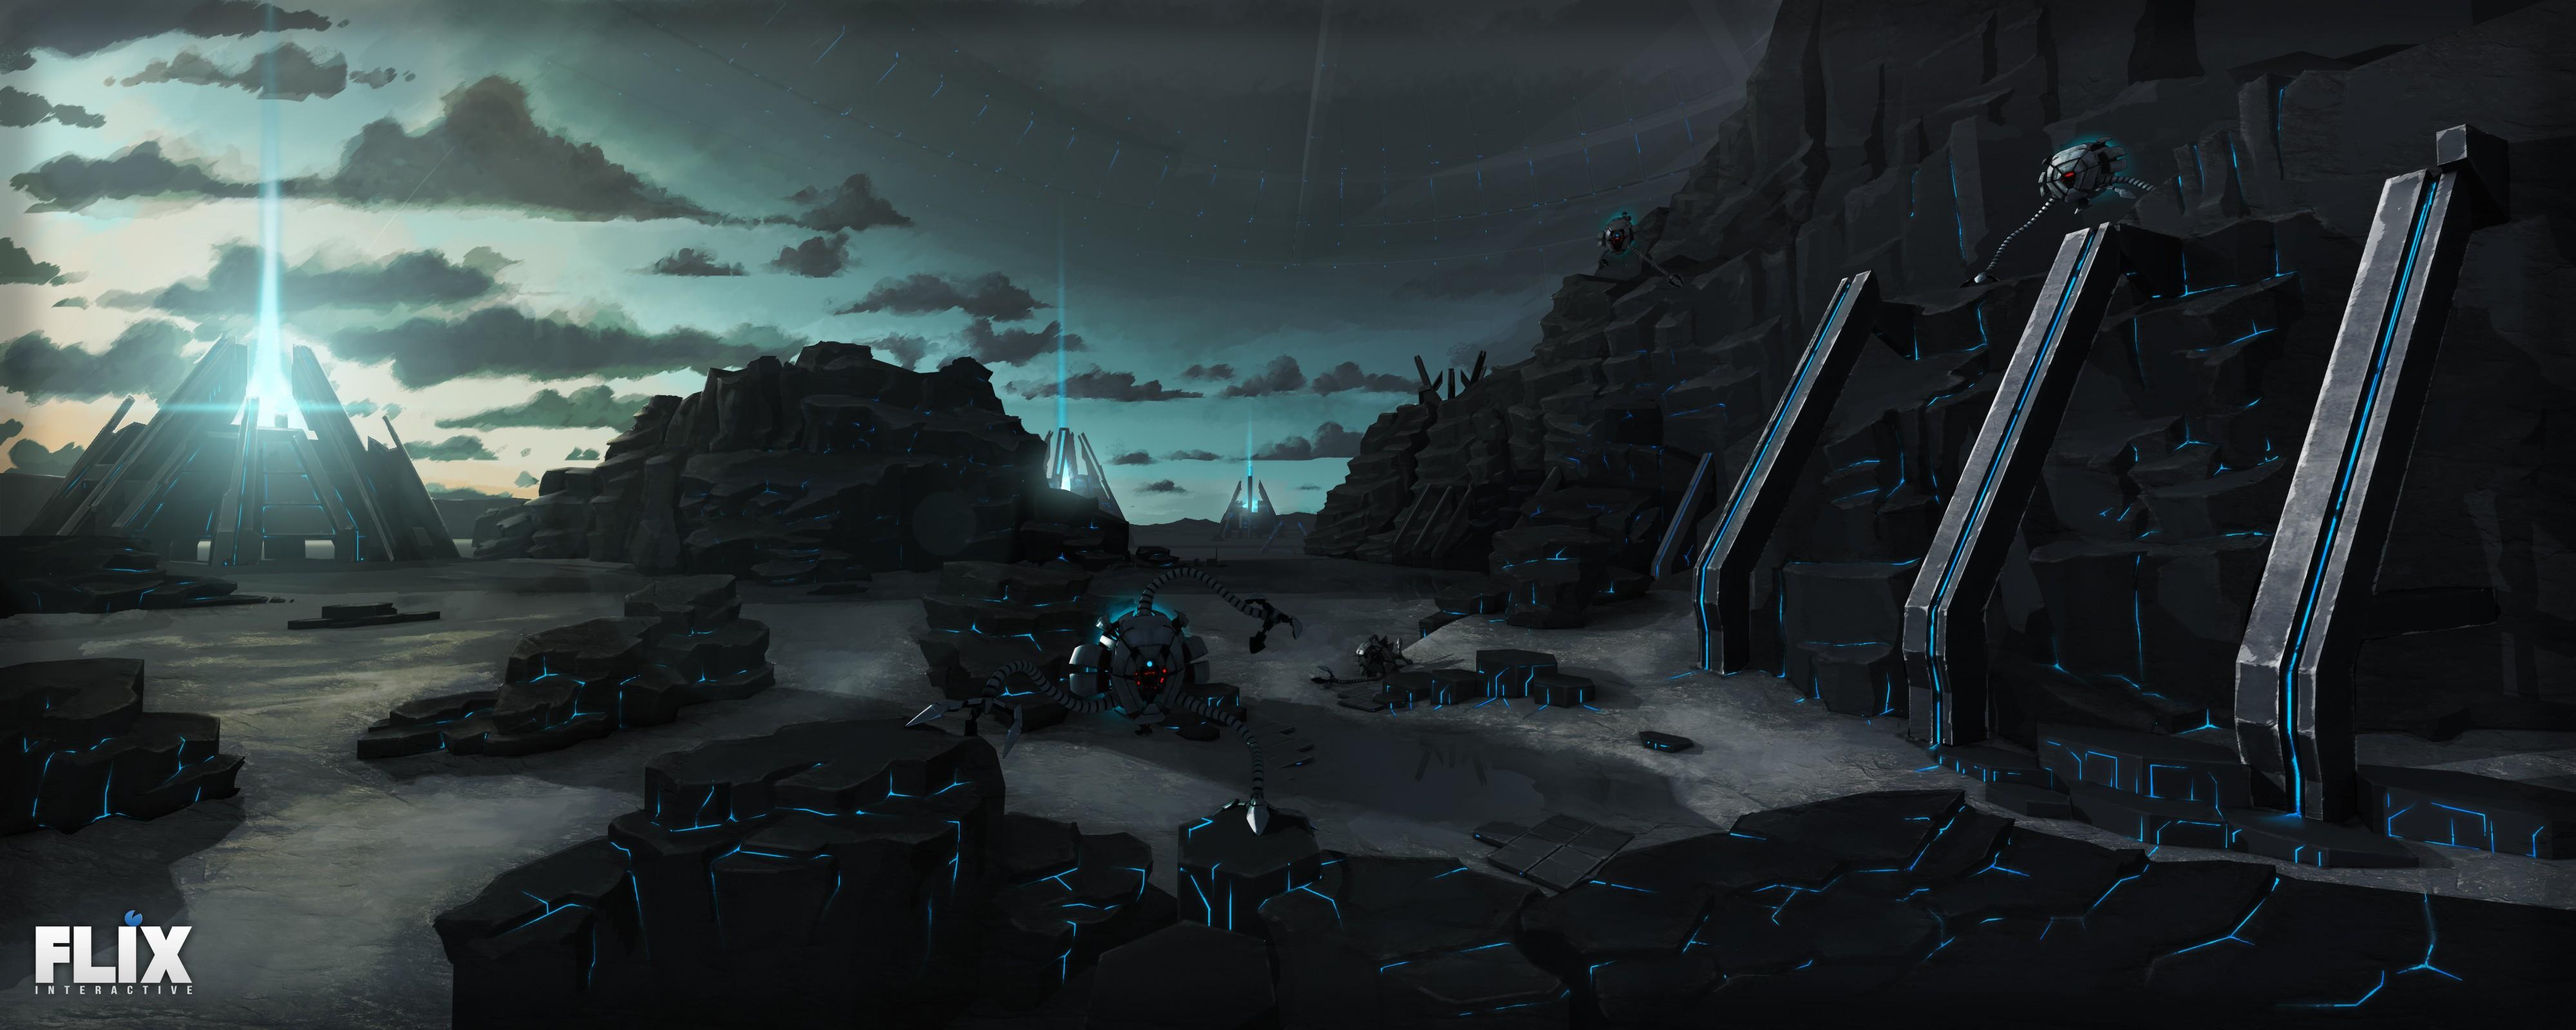 Wallpaper Eden Star Best Games 2015 Game Sci Fi Space